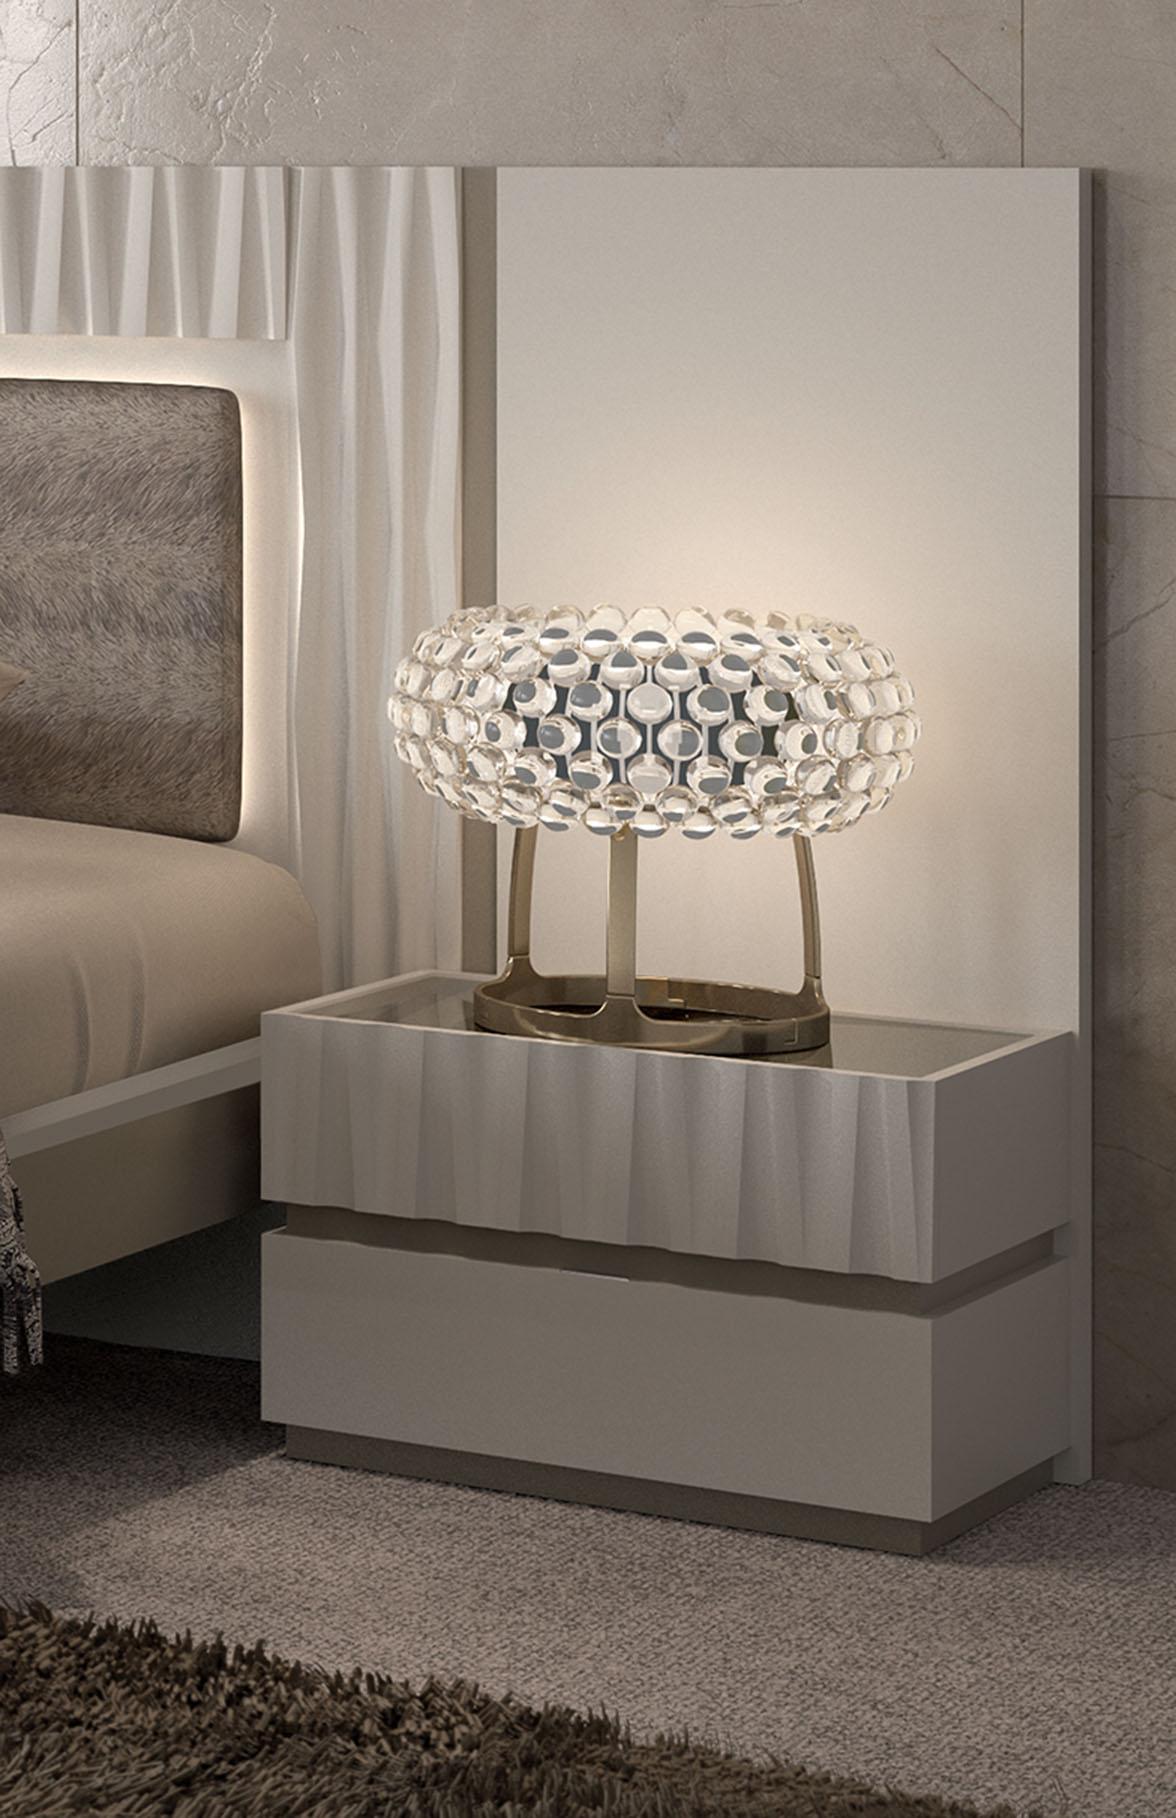 Marina Bedroom, Modern Bedrooms QS and KS, Bedroom Furniture